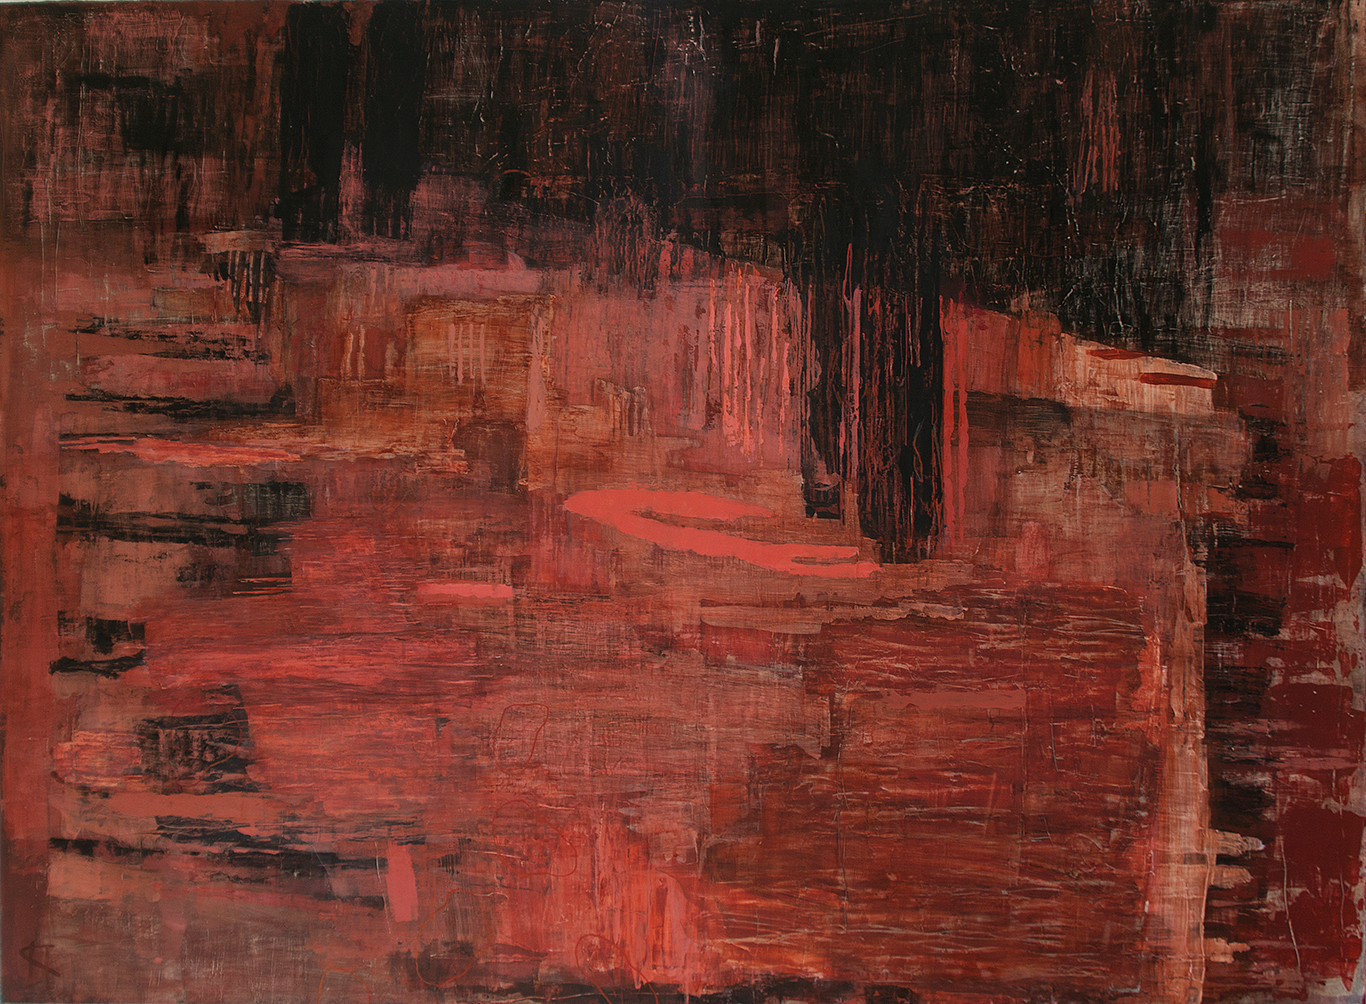 Inre rum: Mått: 122 x 90 cm. Material: Akryl.